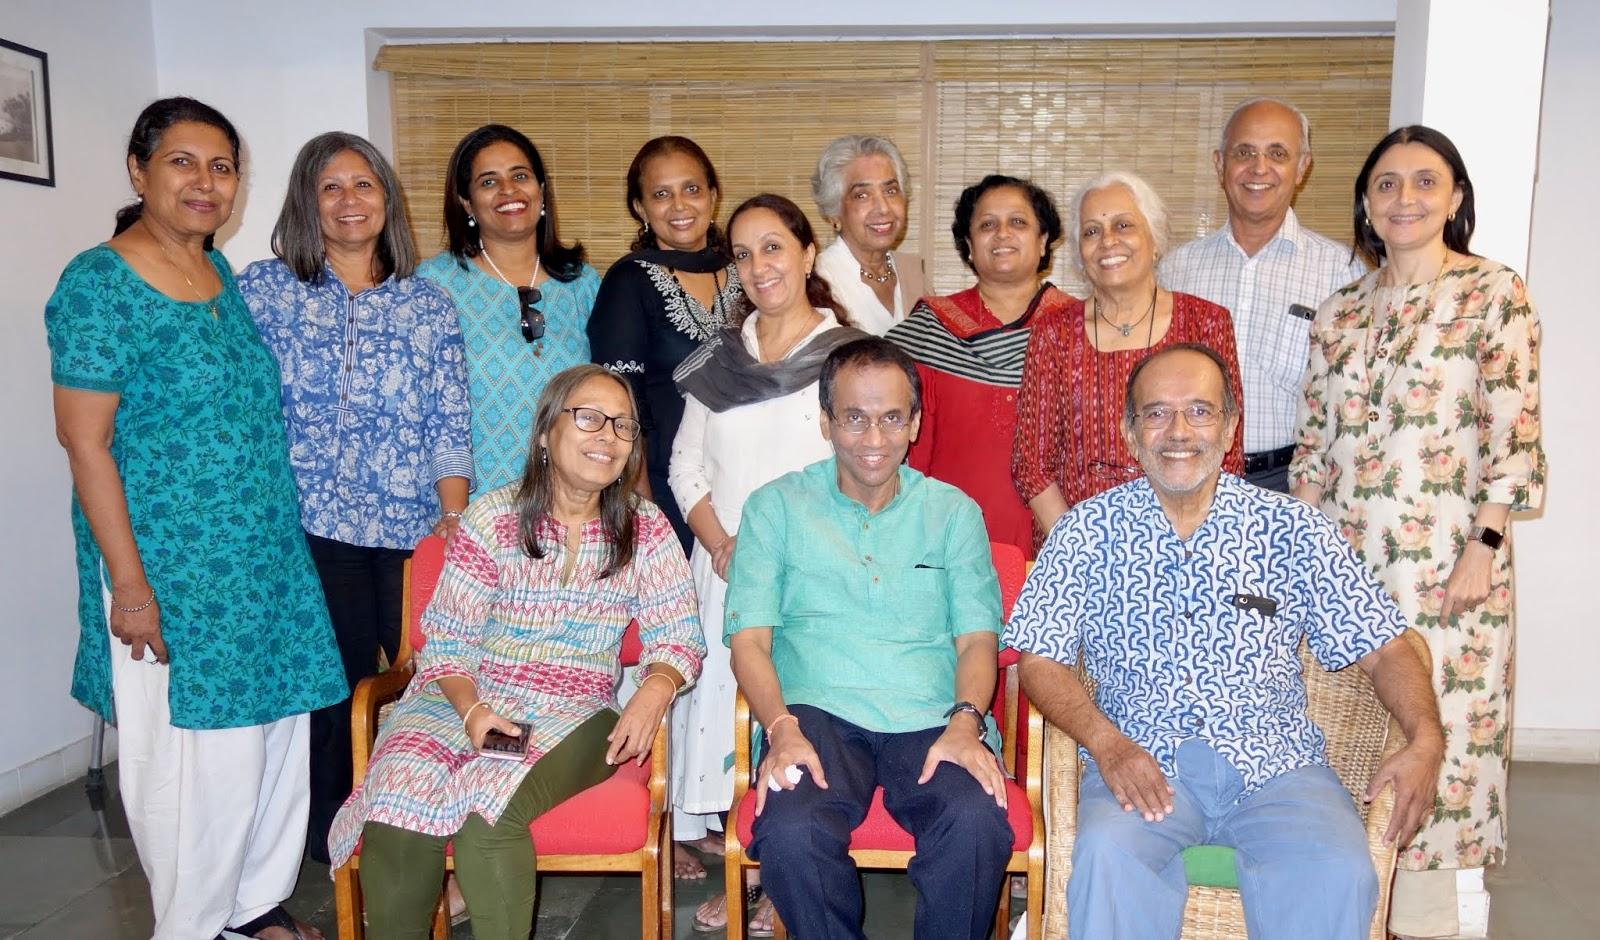 KRG – The Kochi Reading Group: A Shakespeare Celebration – Apr 12, 2019